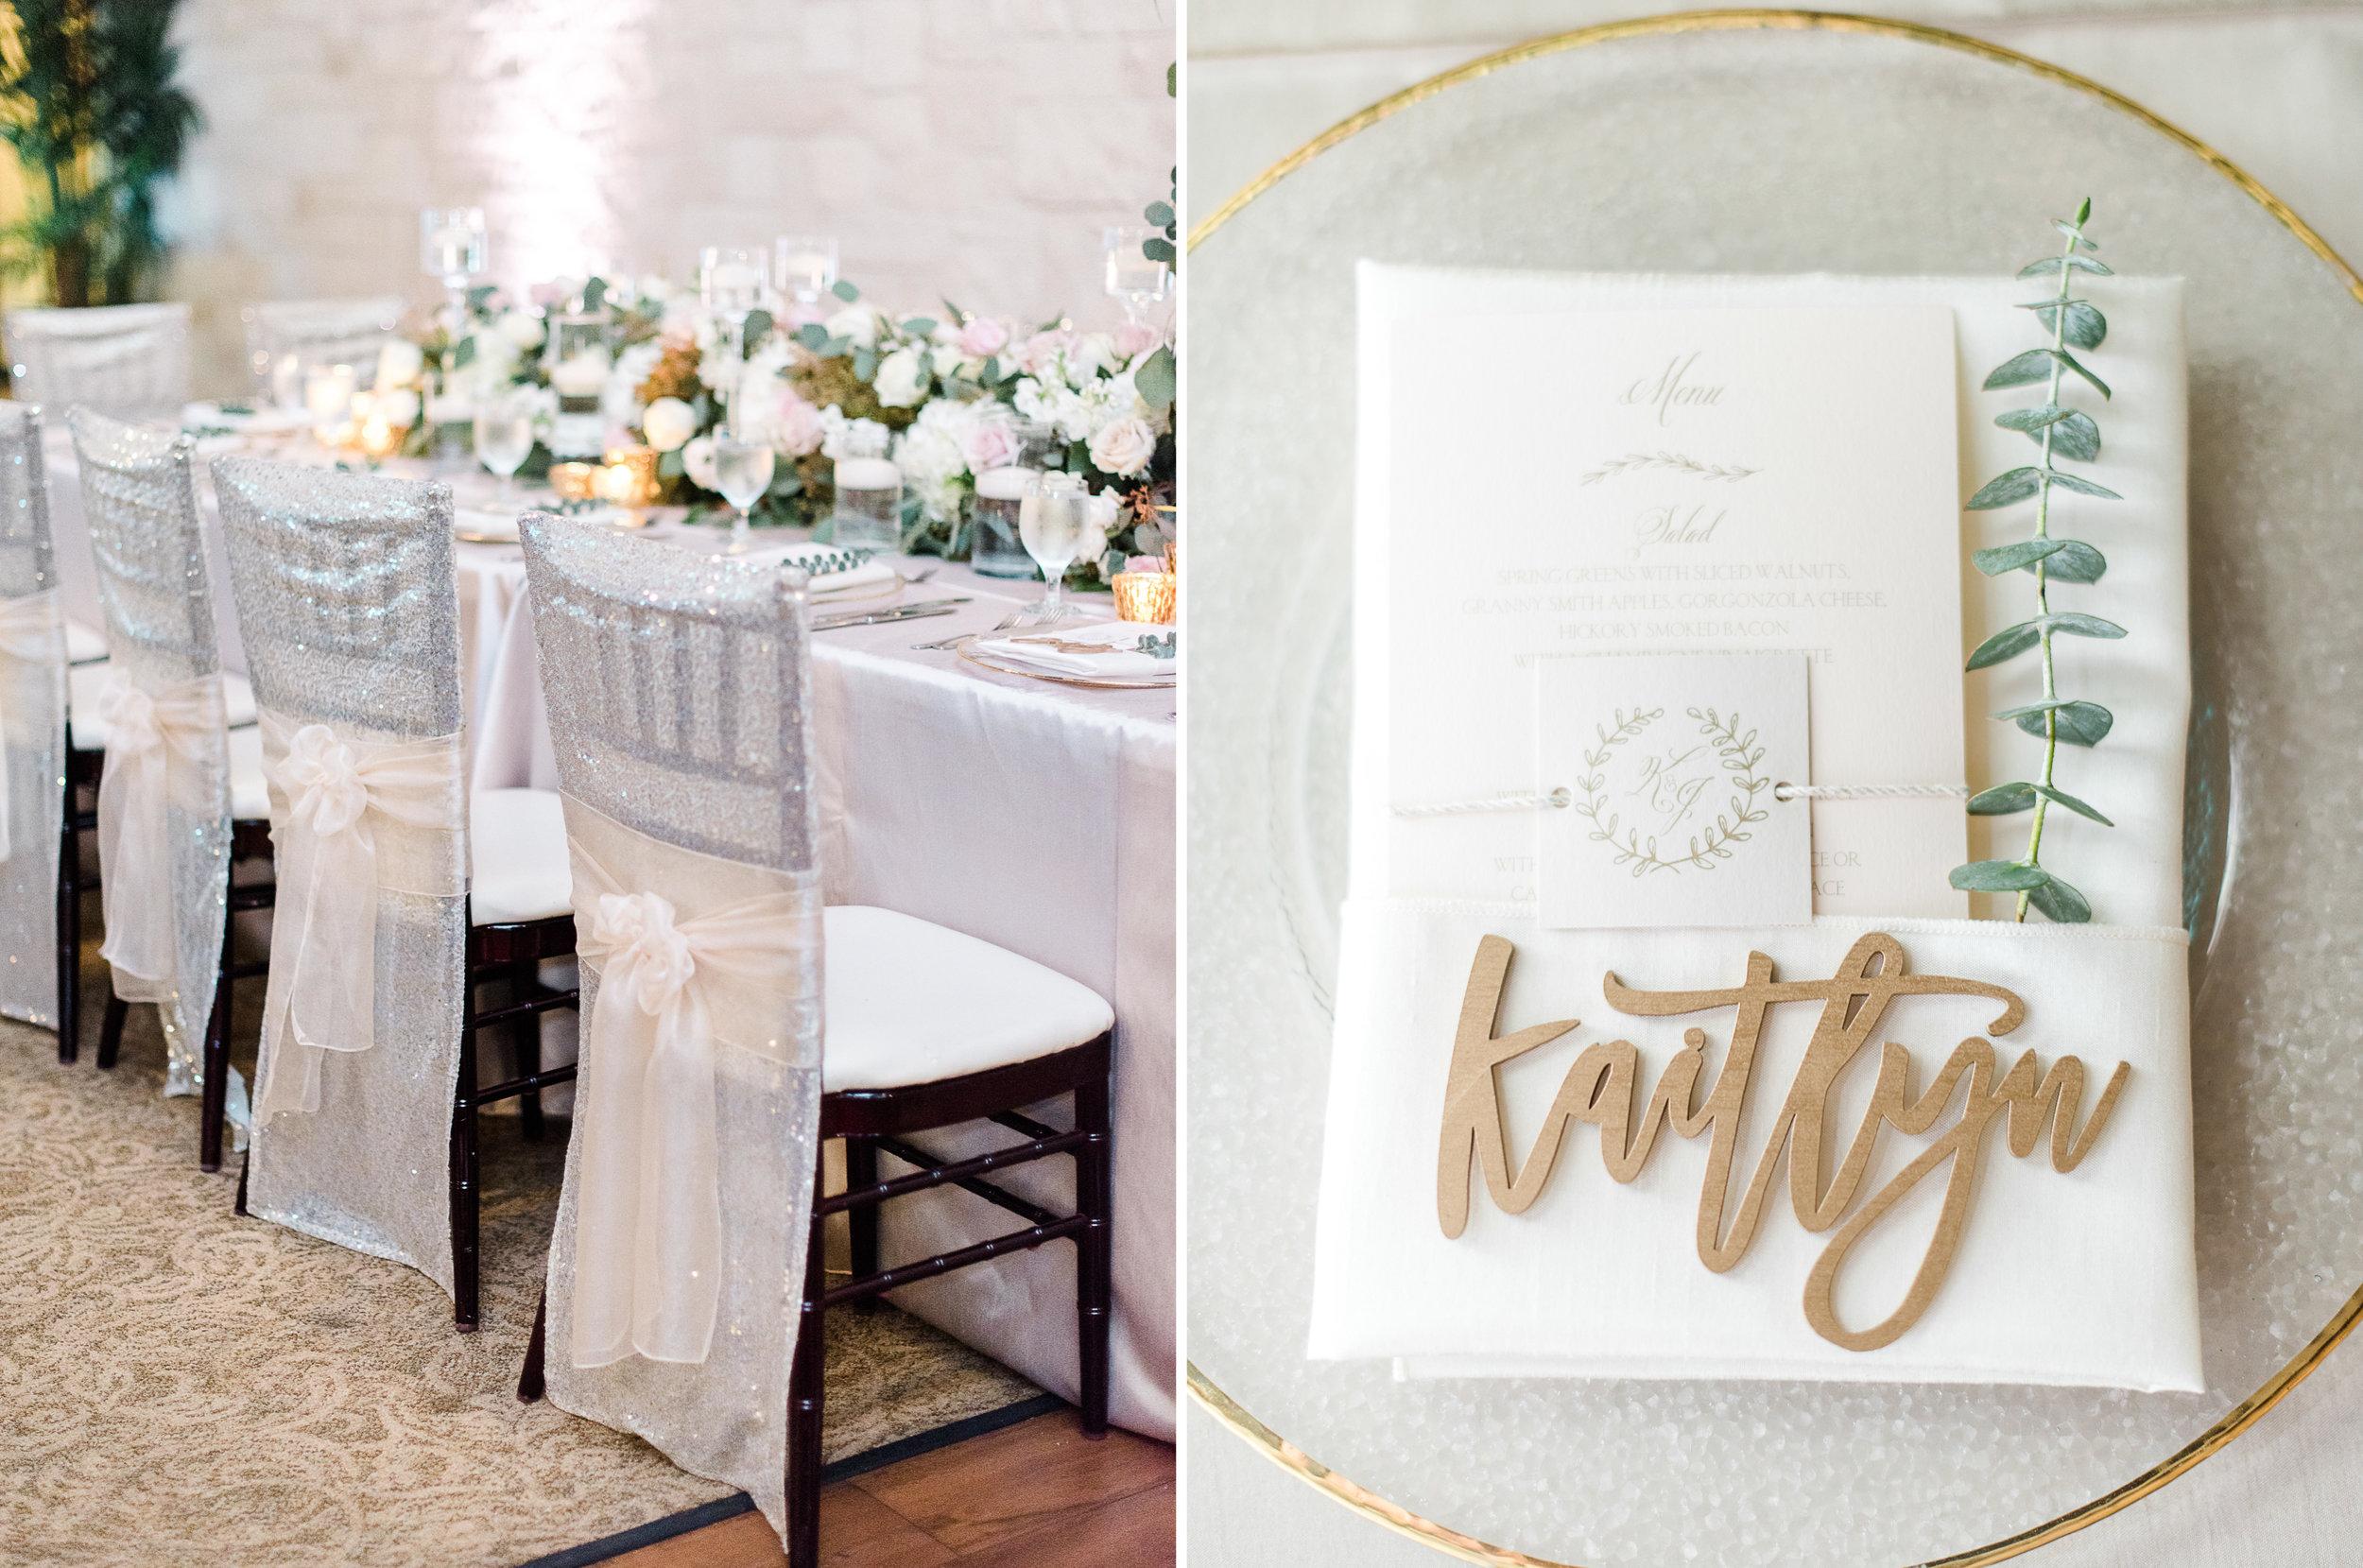 Briscoe-Manor-Houston-Wedding-Photographer-Modern-Luxury-Weddings-Dana-Fernandez-Photograpy-Fine-Art-Photographer-Houston-Film-Destination-PNW-Wedding-Photographer-111.jpg